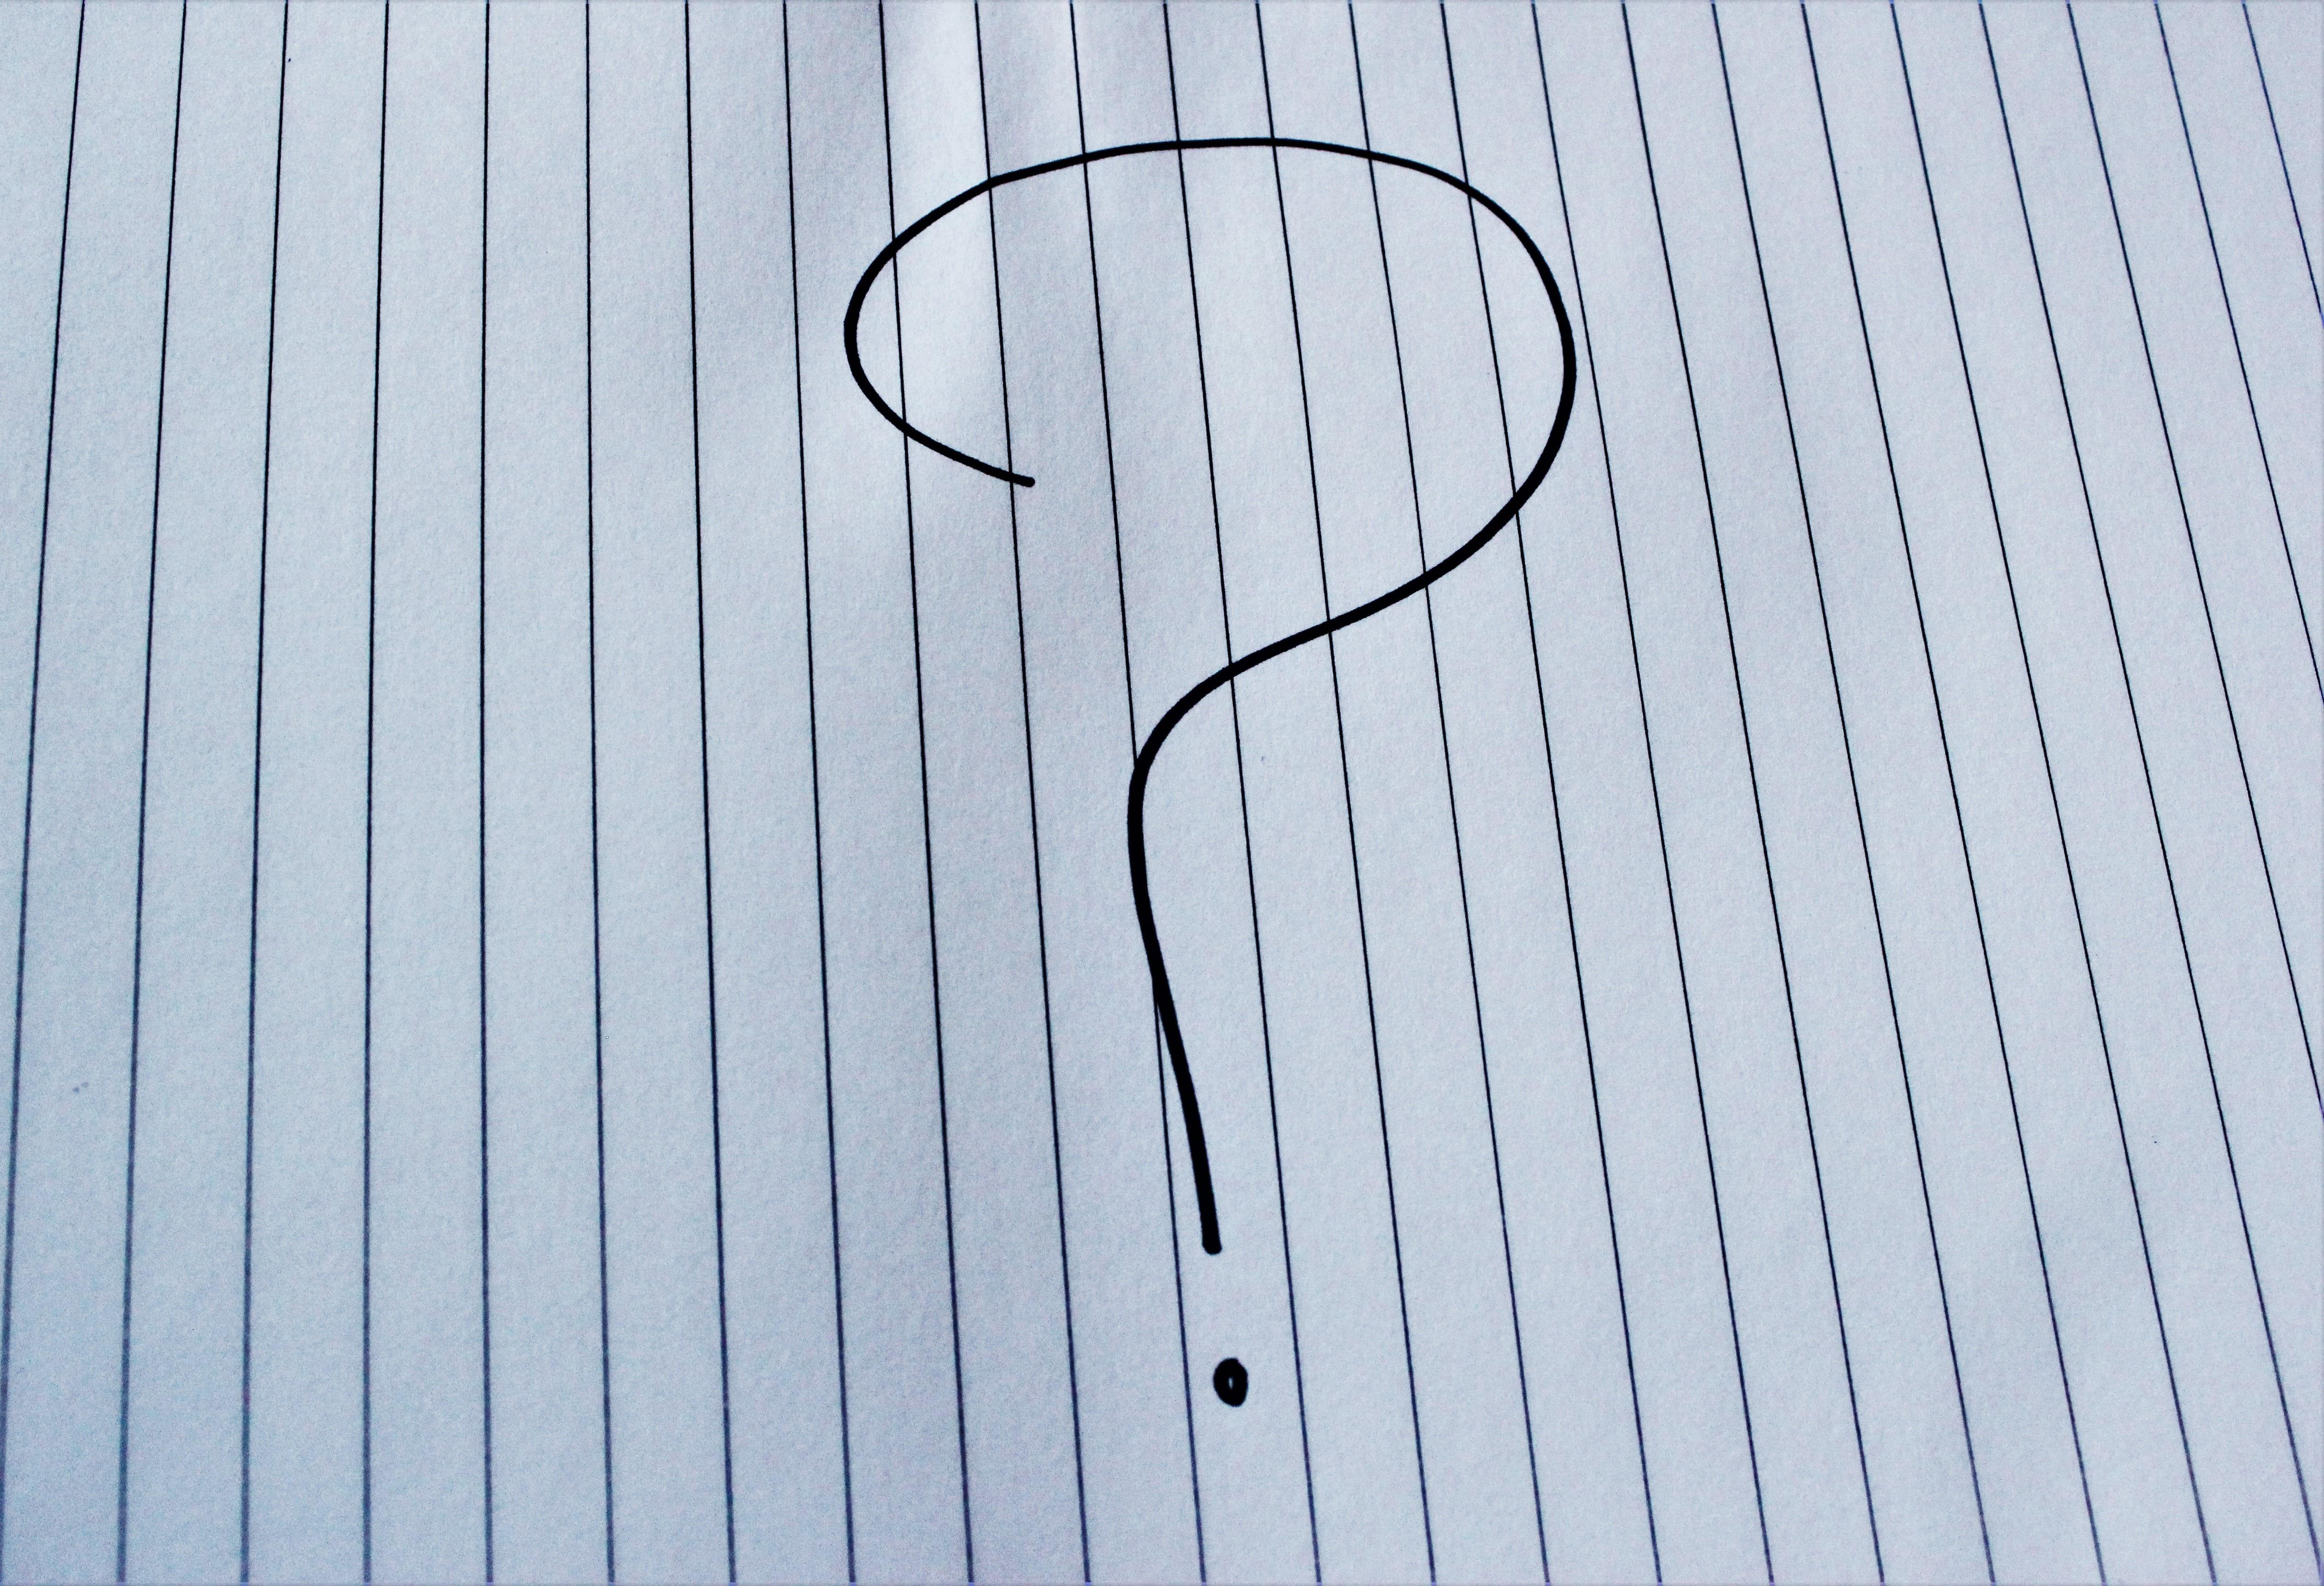 Line Drawing Question Mark : รูปภาพ ปีก จำนวน ลงชื่อ บรรทัด สัญลักษณ์ สีน้ำเงิน